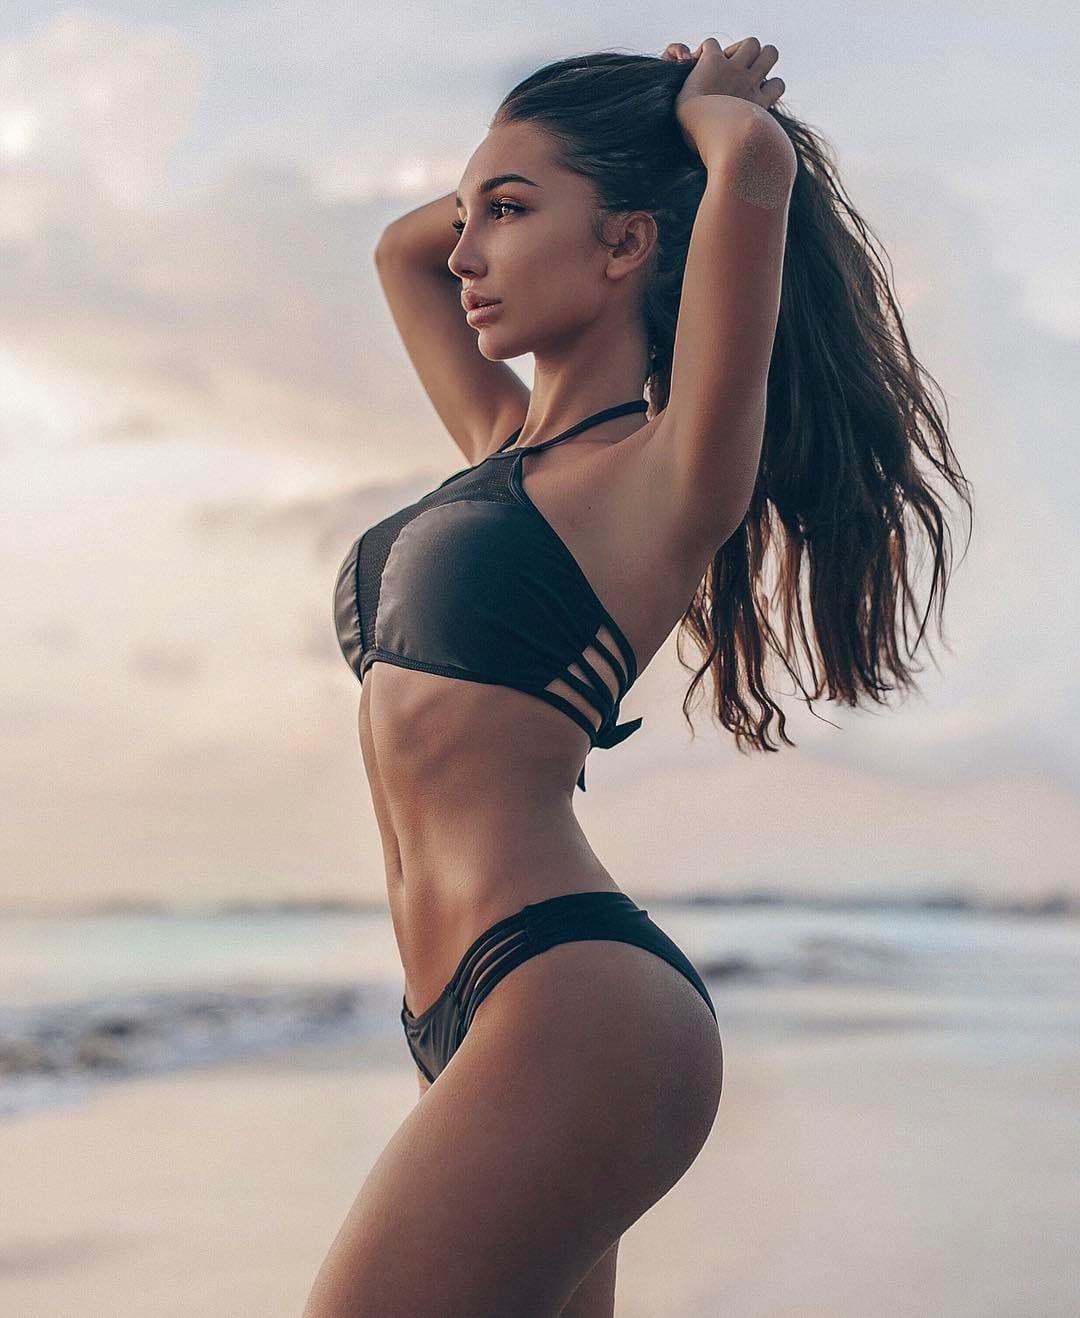 Leaked Anyuta Rai nude (54 photos), Instagram